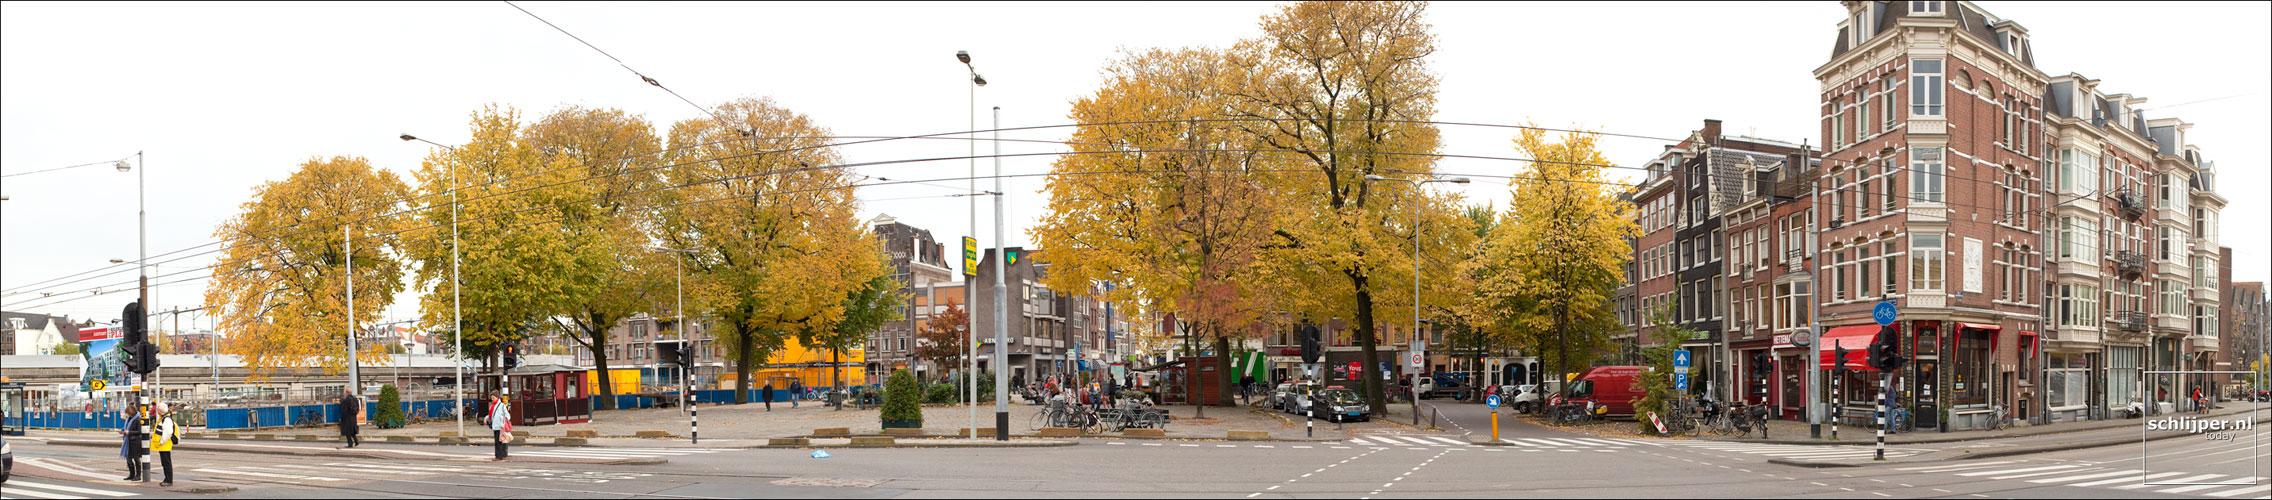 Nederland, Amsterdam, 29 oktober 2010